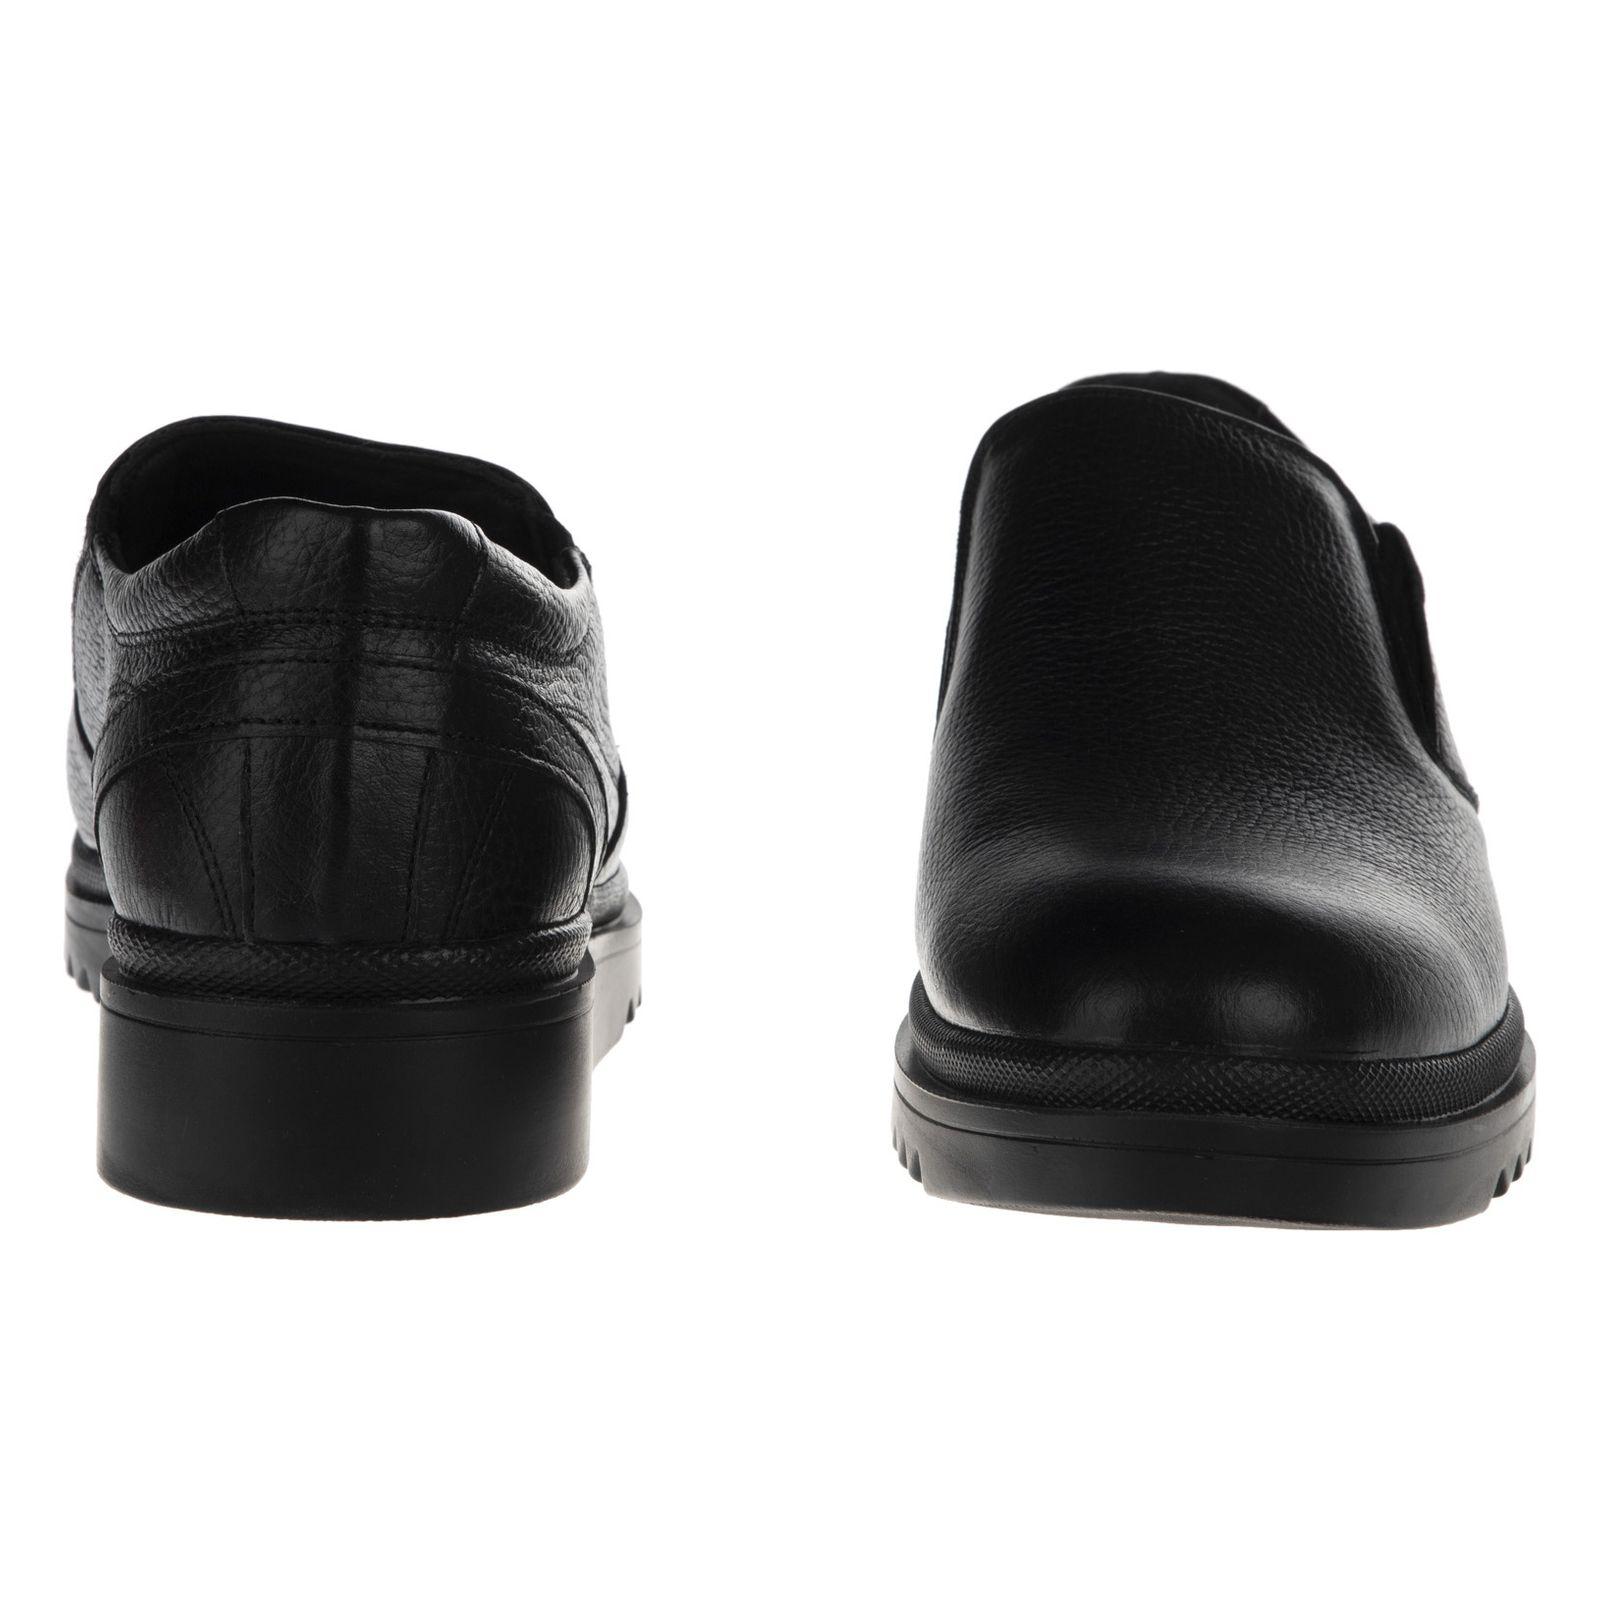 کفش روزمره مردانه شیفر مدل 7160A-101 -  - 5